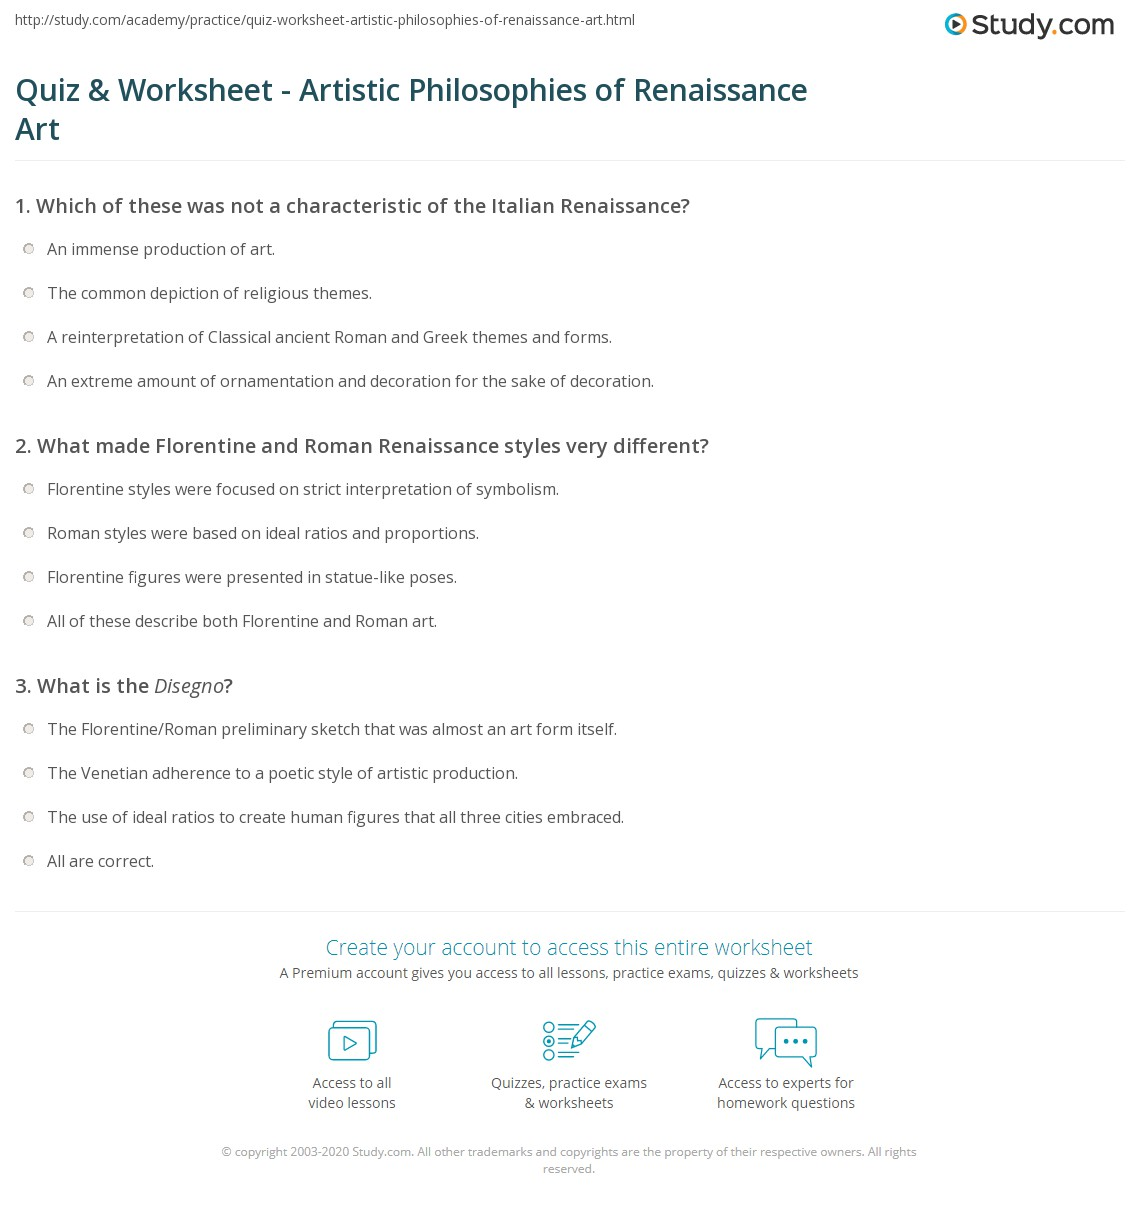 quiz worksheet artistic philosophies of renaissance art florentine and r work worksheet